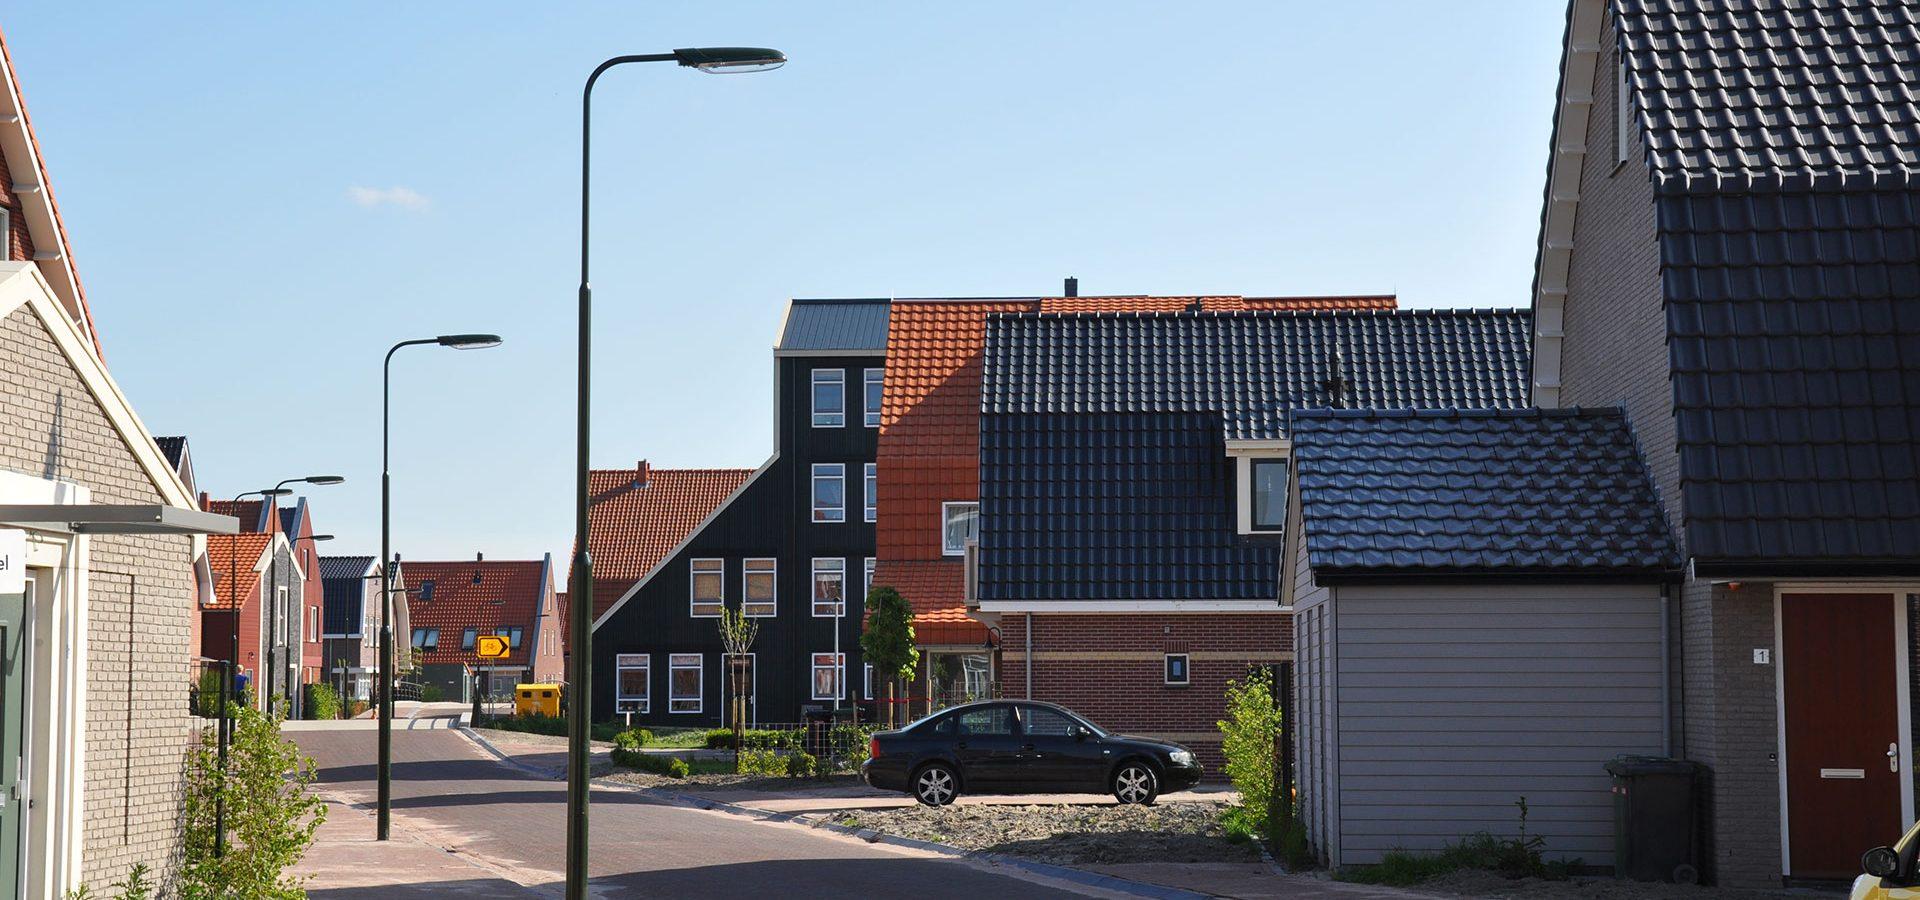 FARO architecten Twuyverhoek Sint Pancras 06